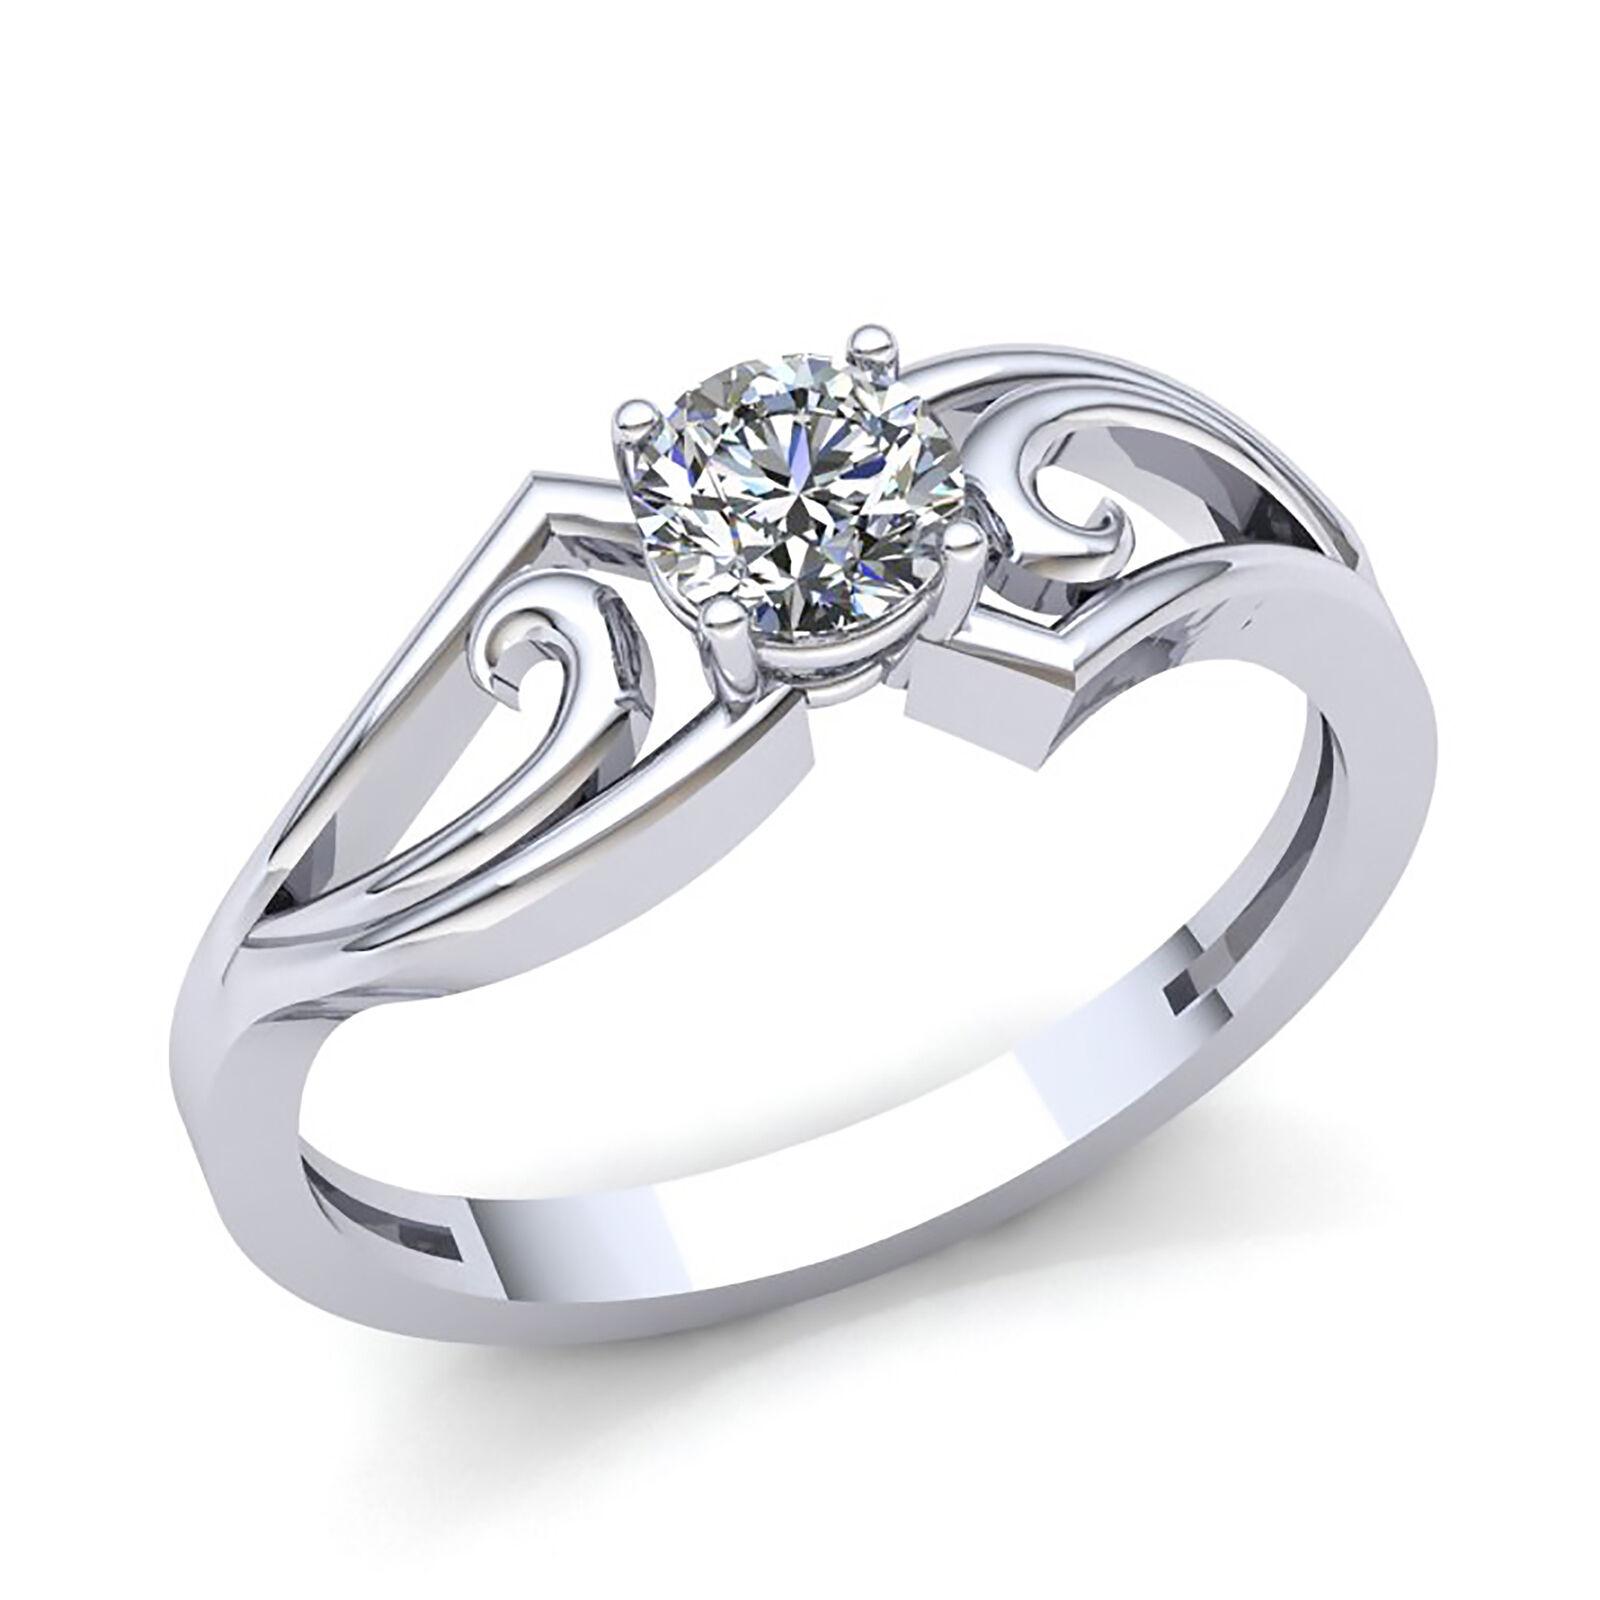 Genuine 1 4ctw Round Cut Diamond Women's Solitaire Engagement Ring 18K gold